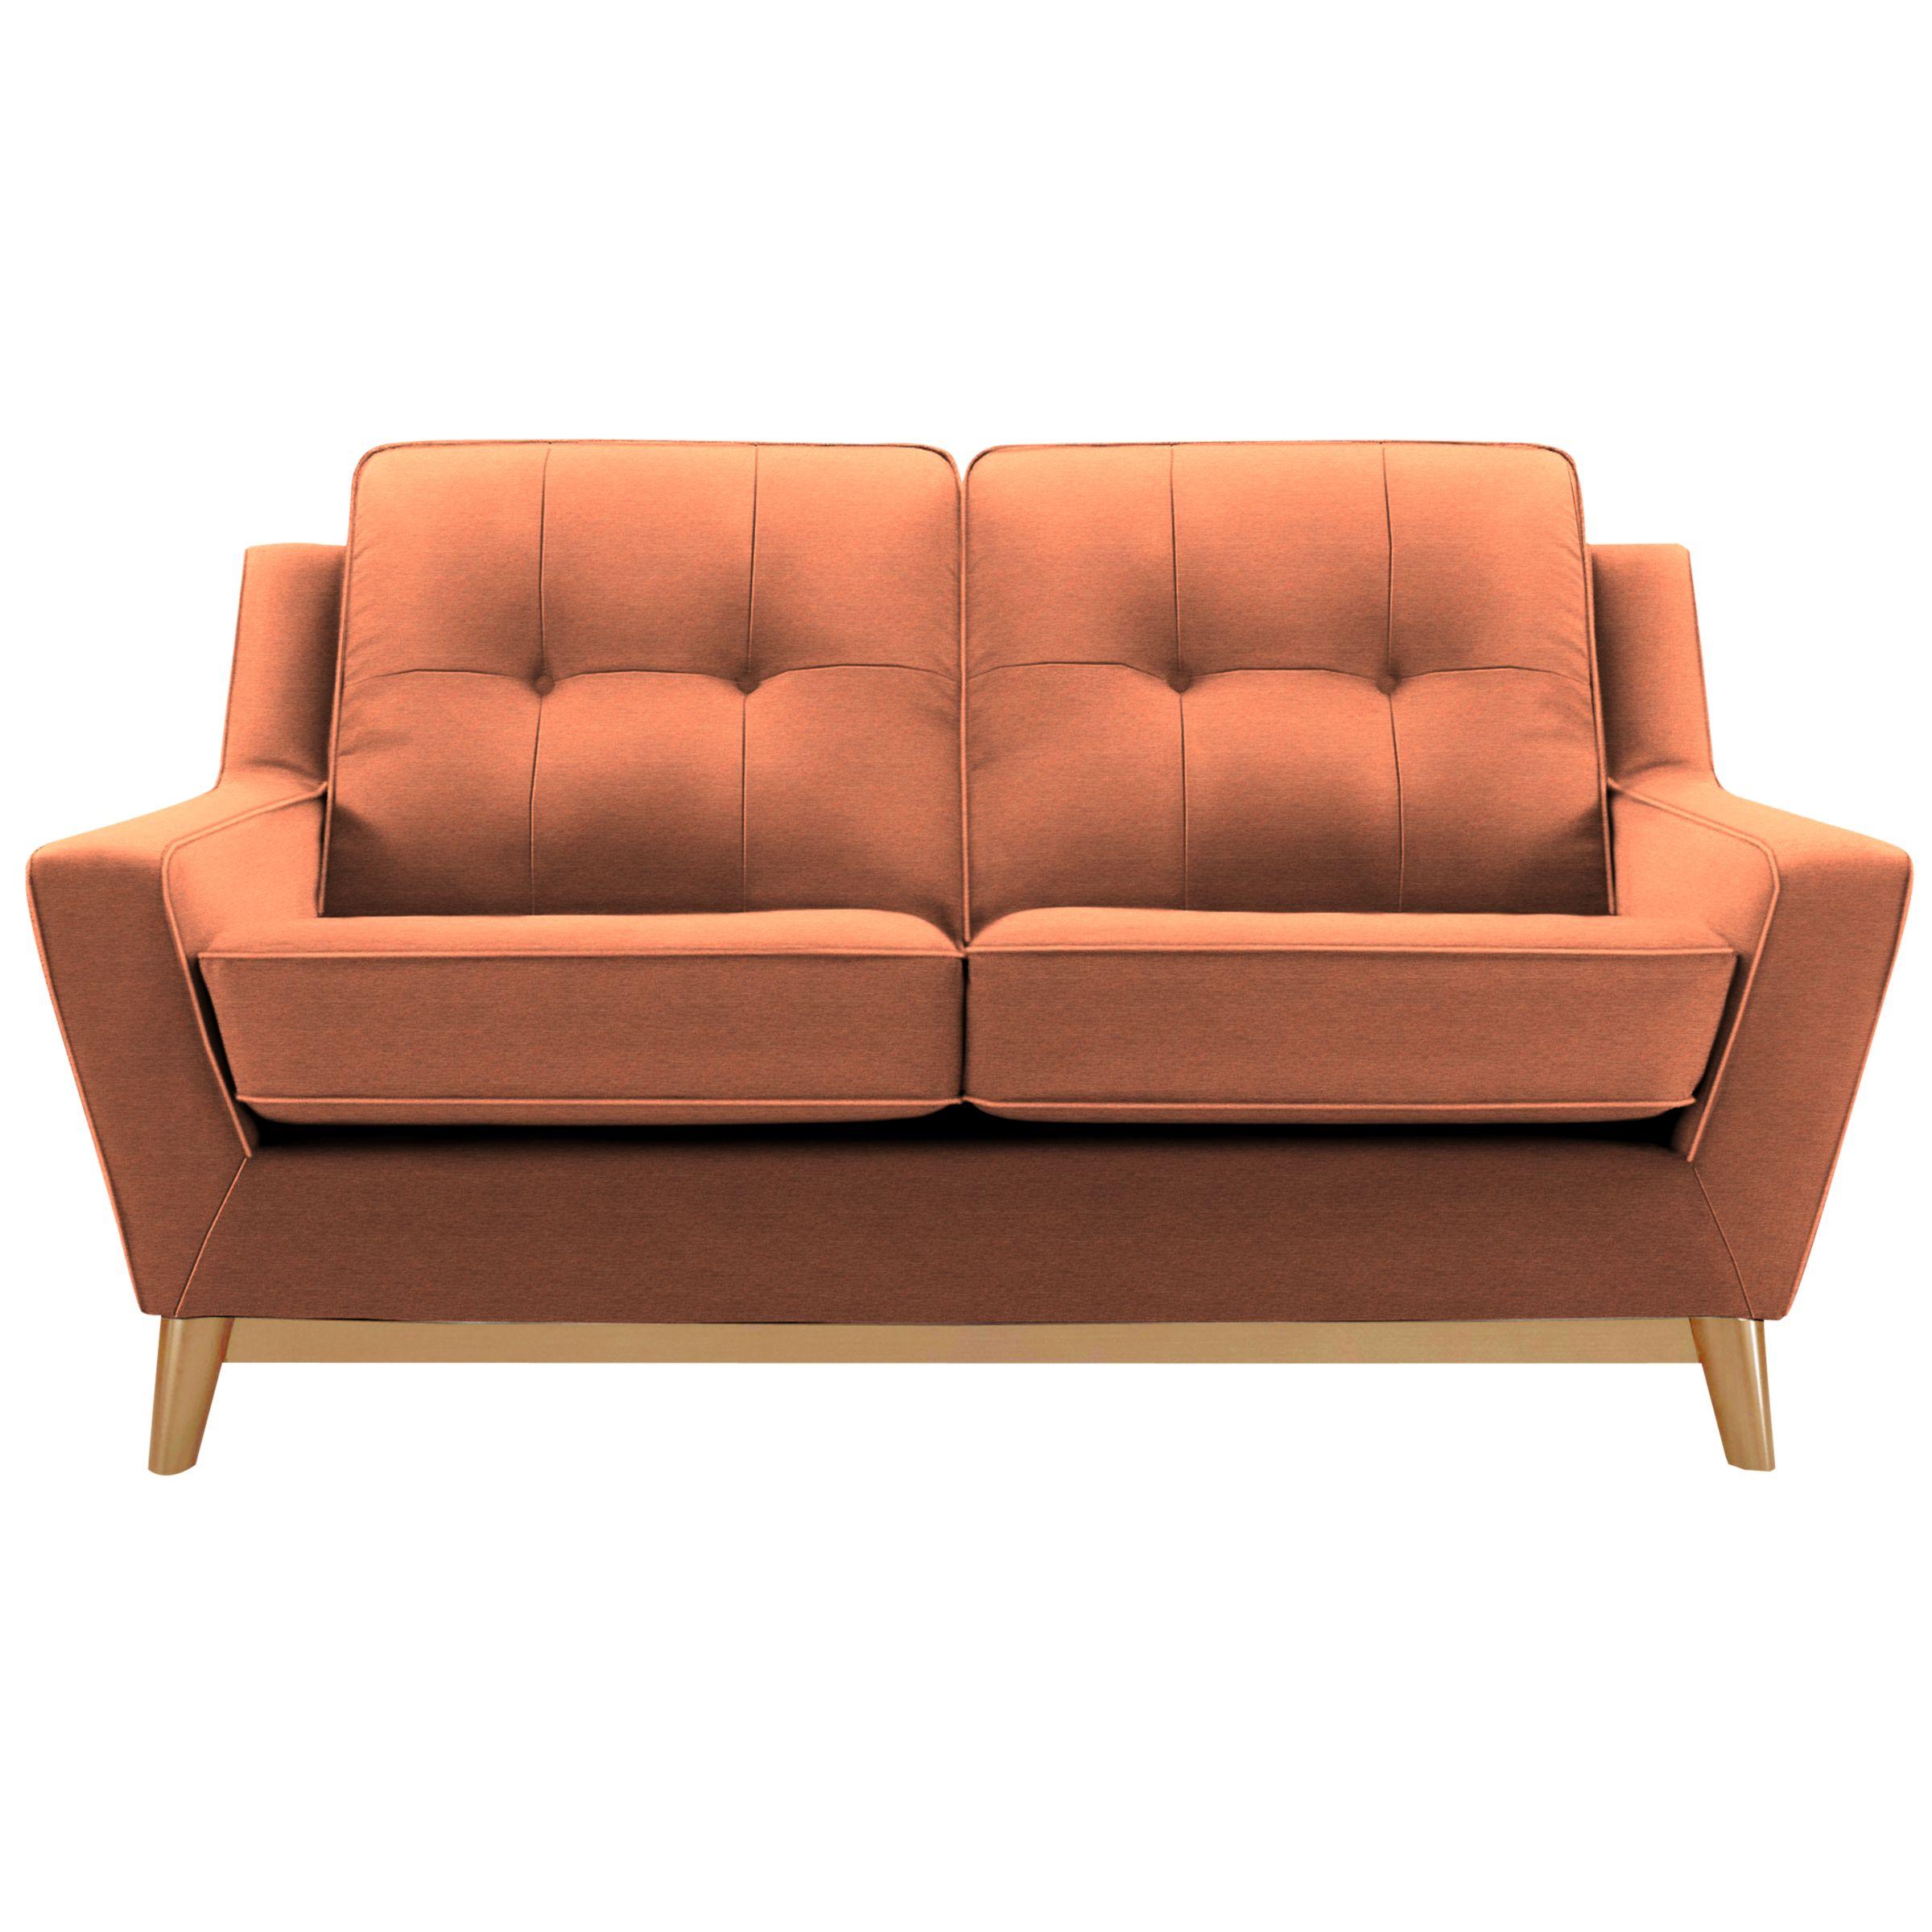 G Plan Vintage The Fifty Three Small Sofa, Tonic Orange